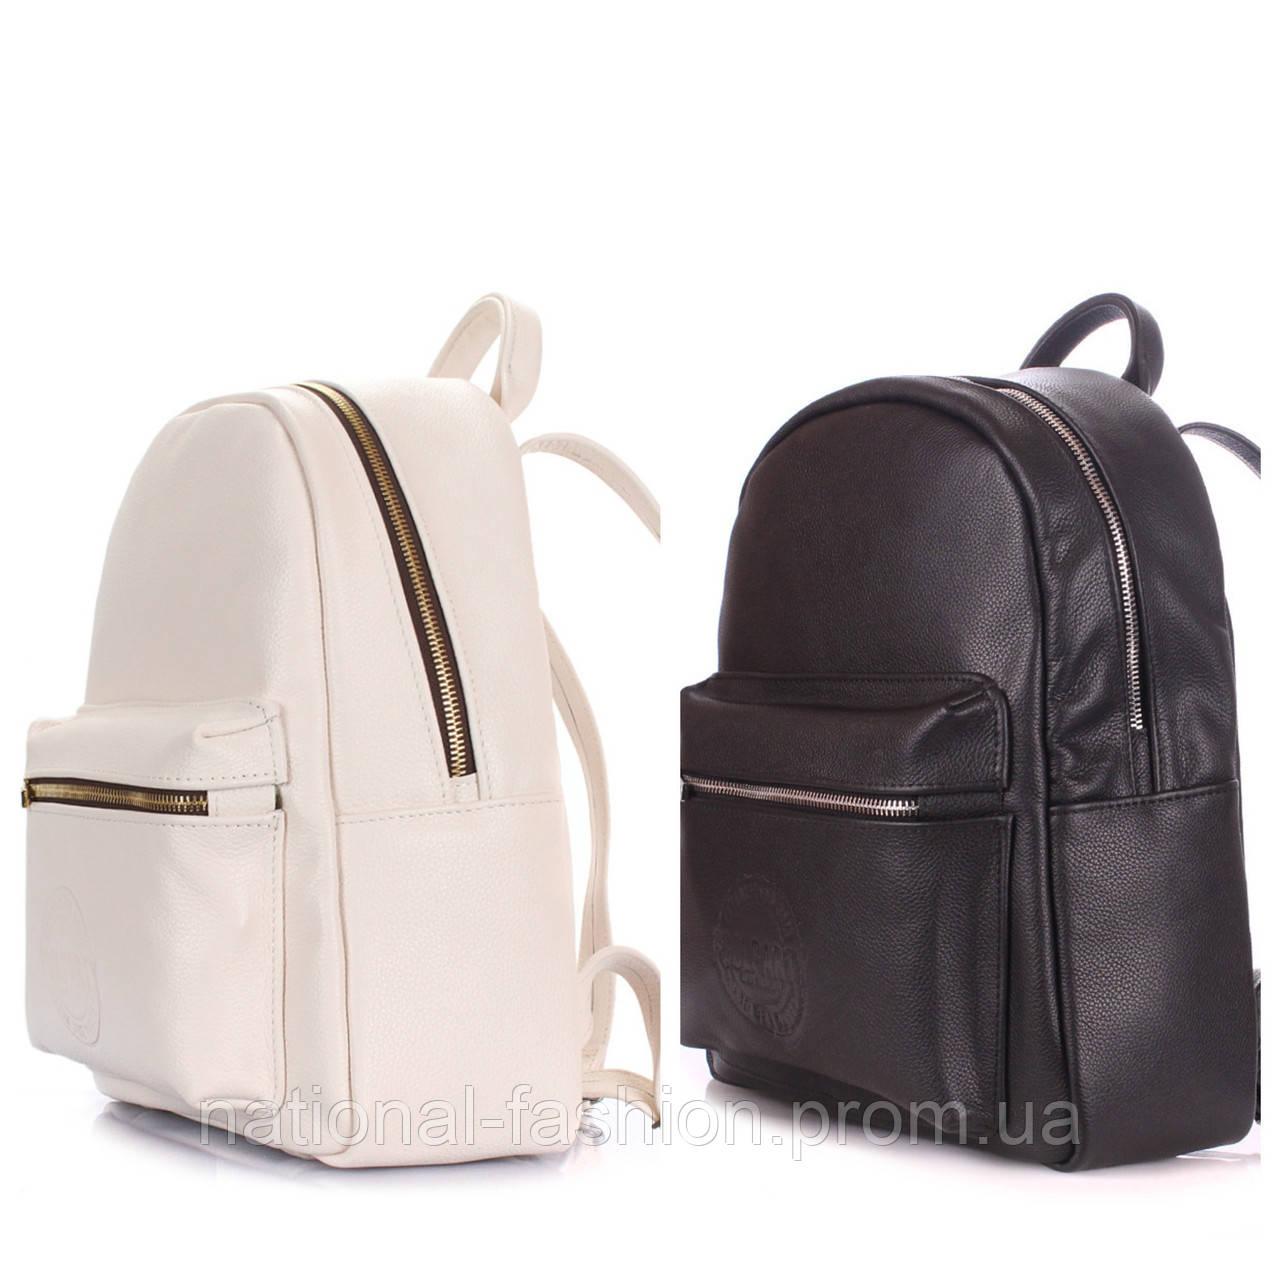 23b716c4ade7 Рюкзак женский кожаный POOLPARTY Xs (leather): продажа, цена в ...